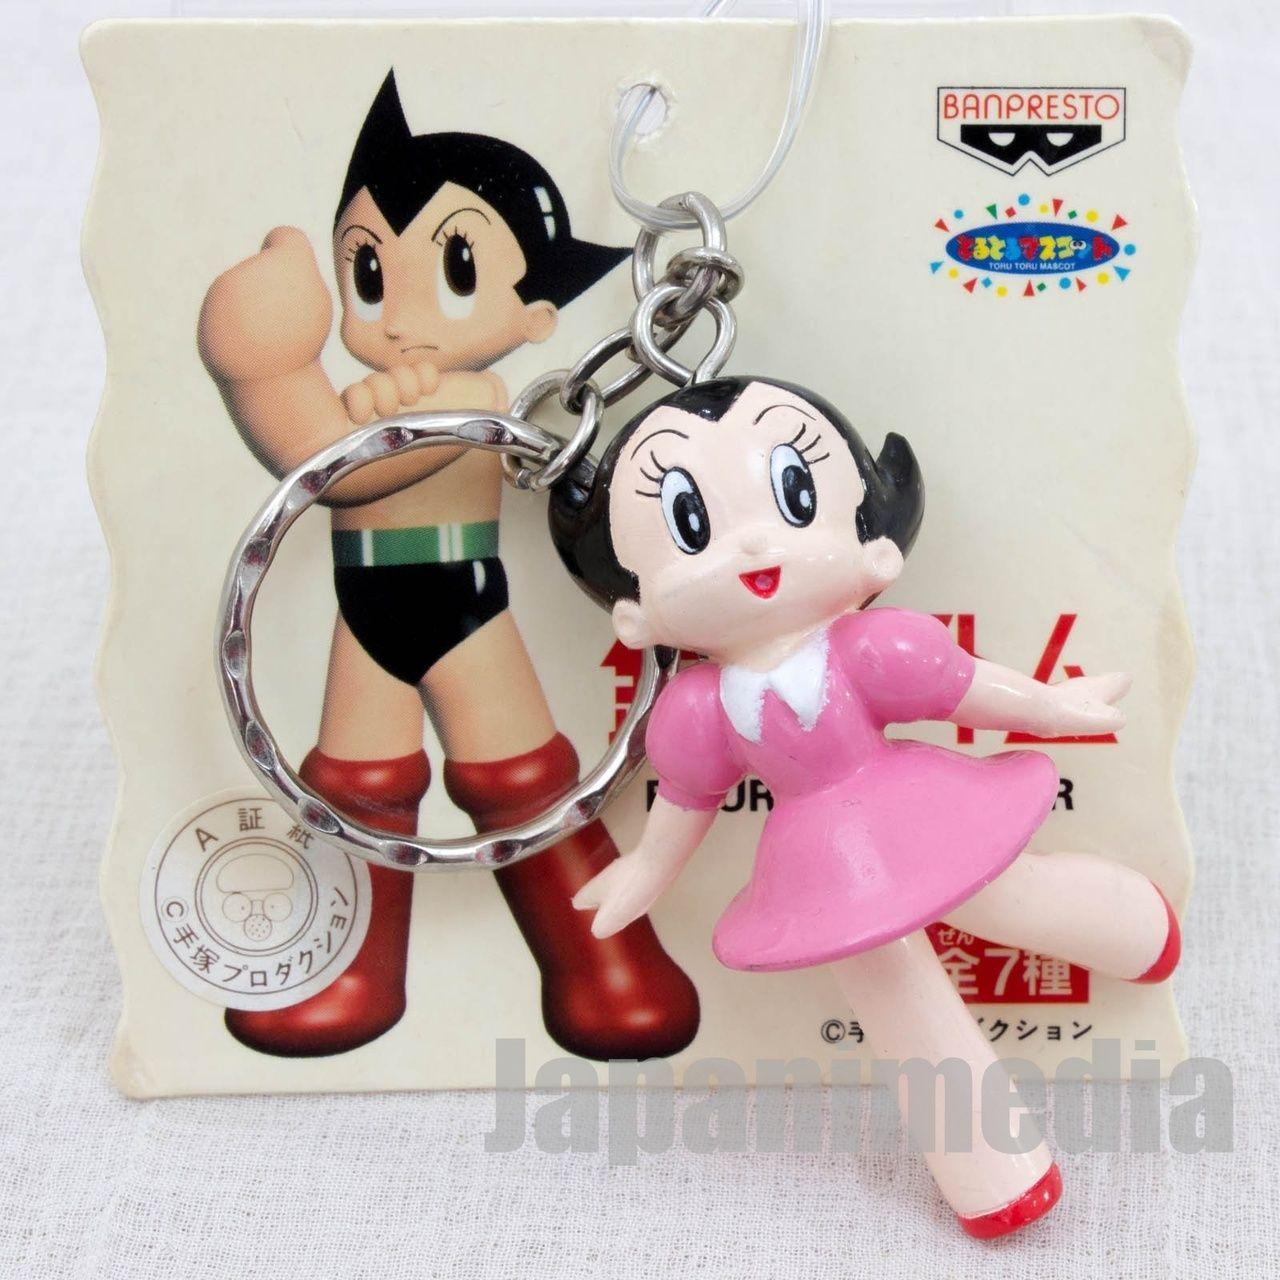 astro boy uran mascot figure key chain osamu tezuka japan anime astro boy astro mascot